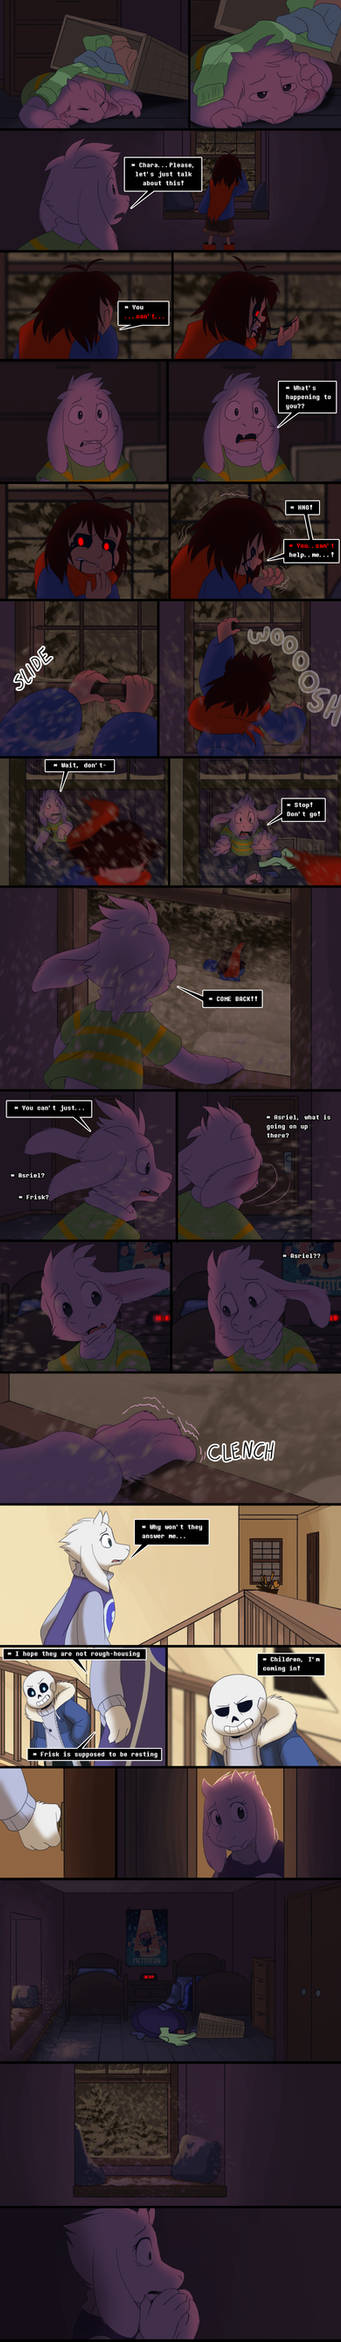 Endertale - Page 39